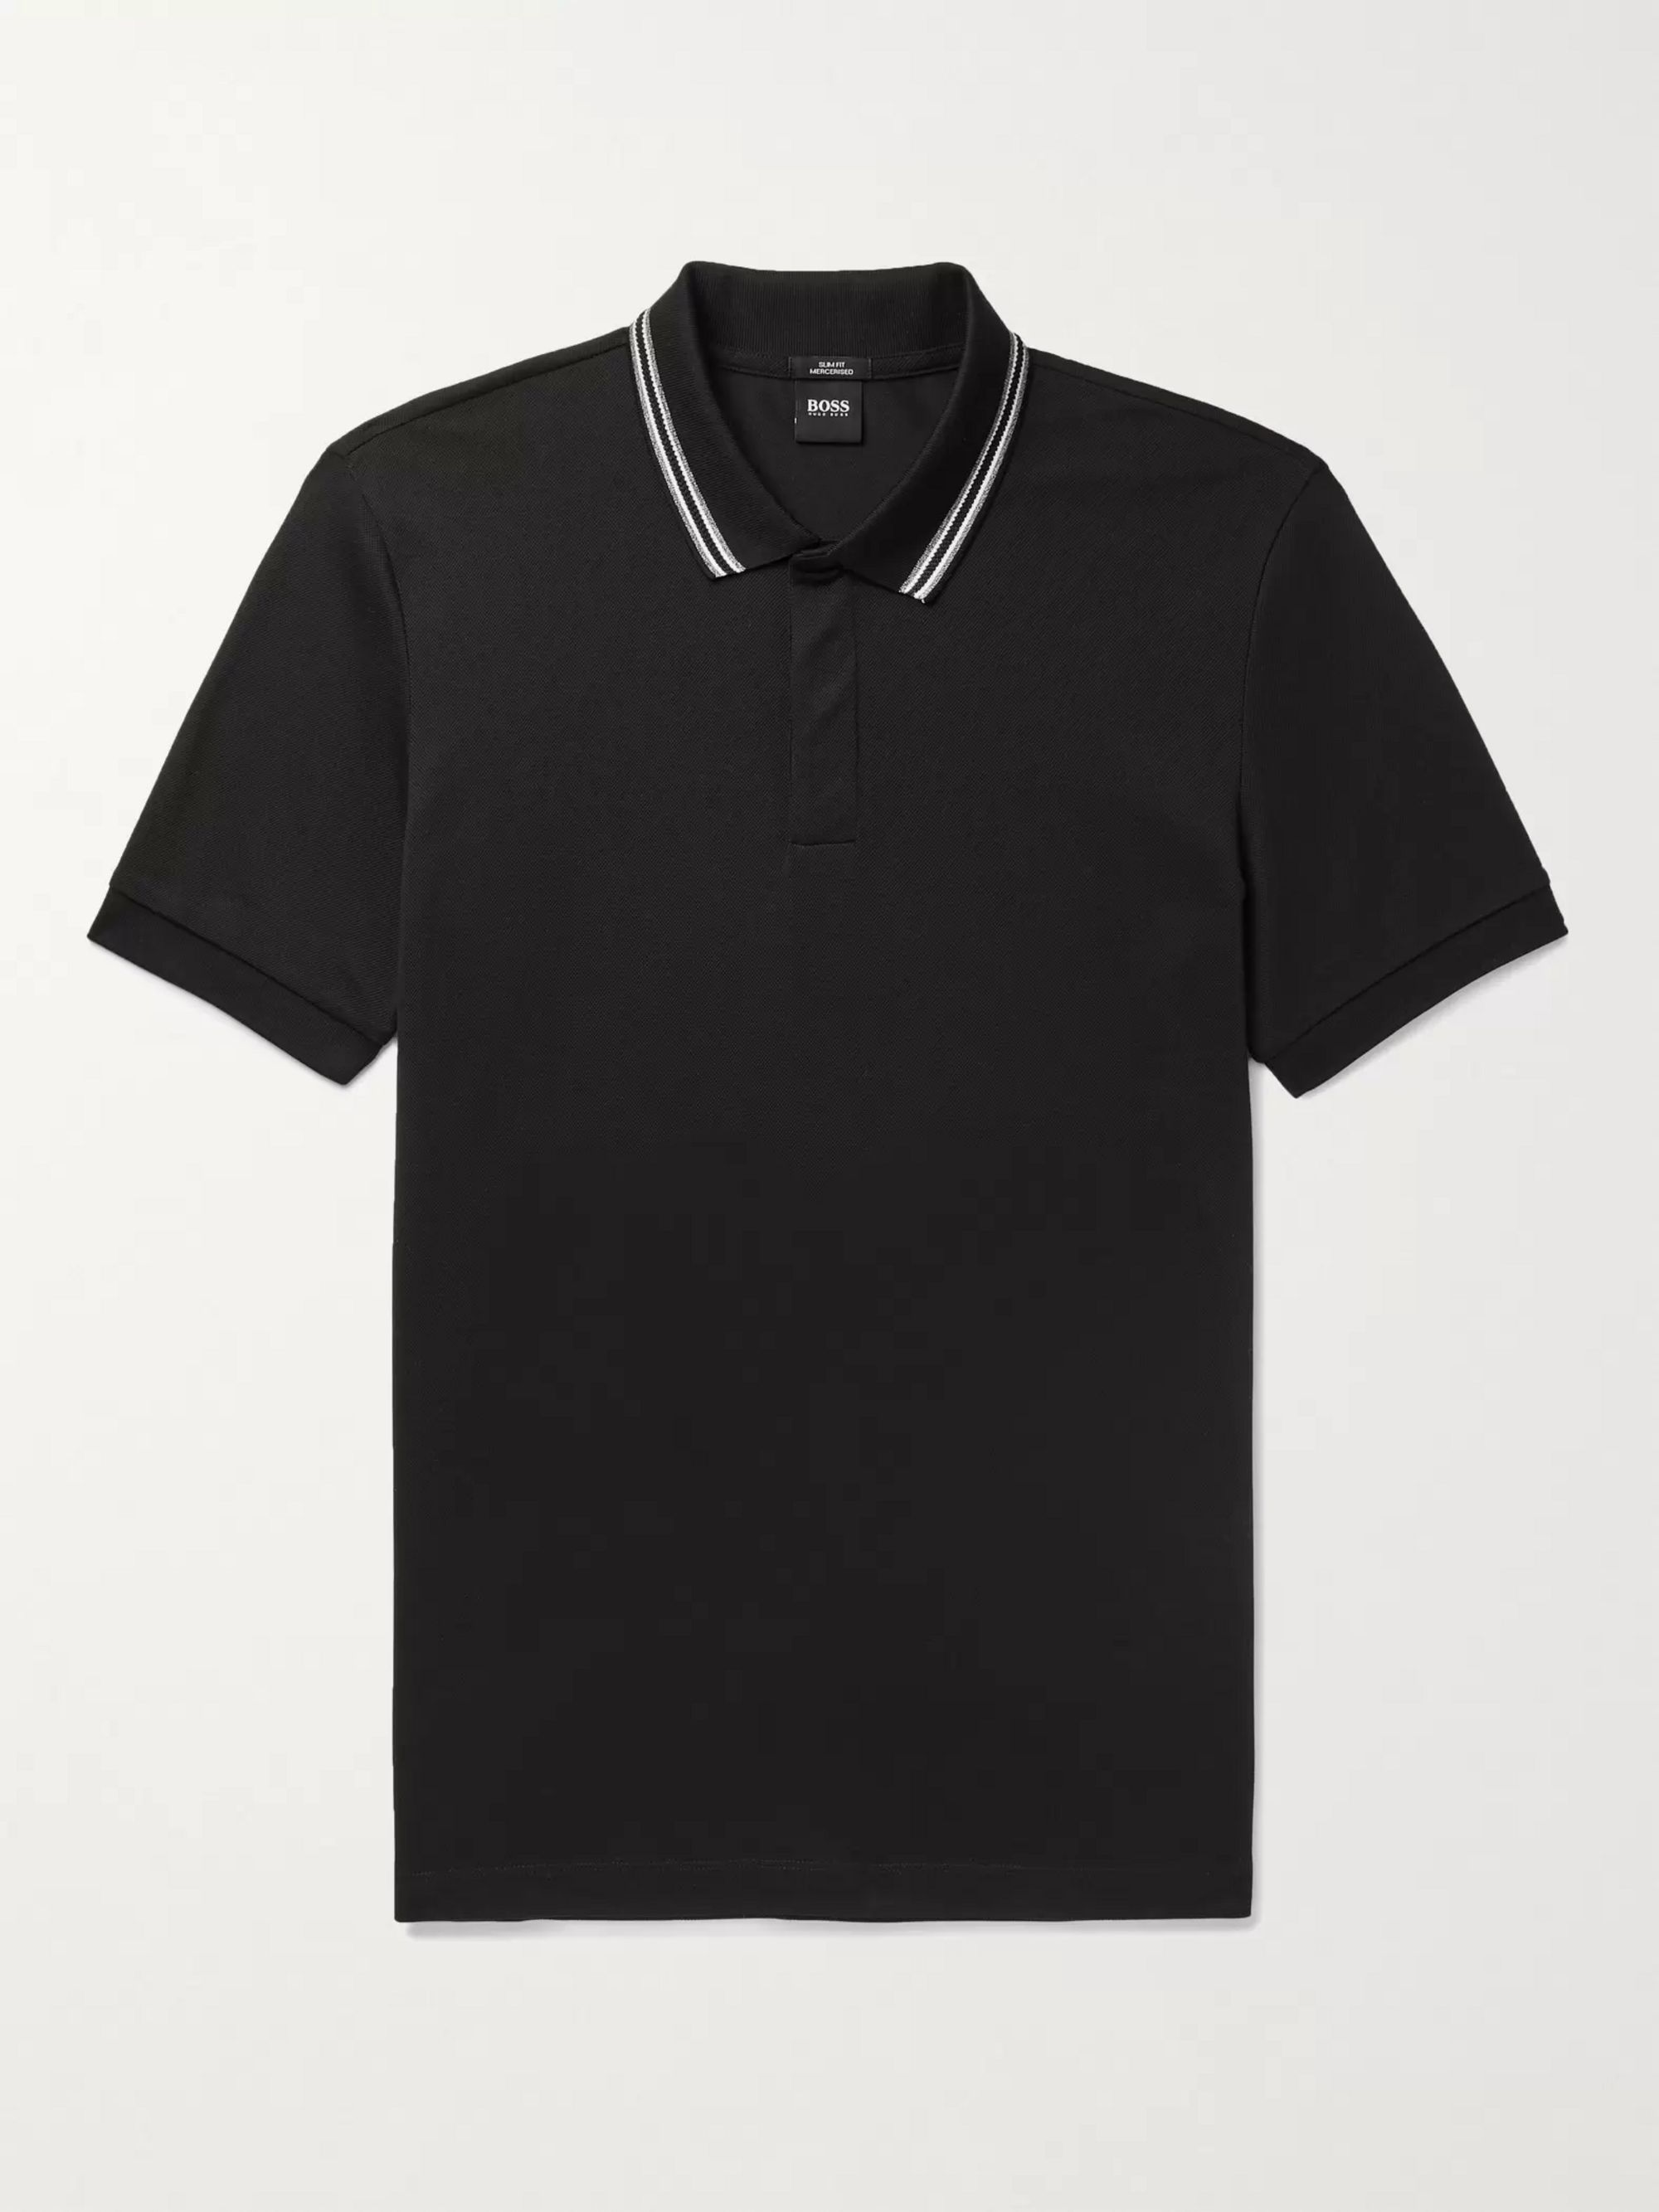 HUGO BOSS Penrose Contrast-Tipped Mercerised Cotton-Pique Polo Shirt